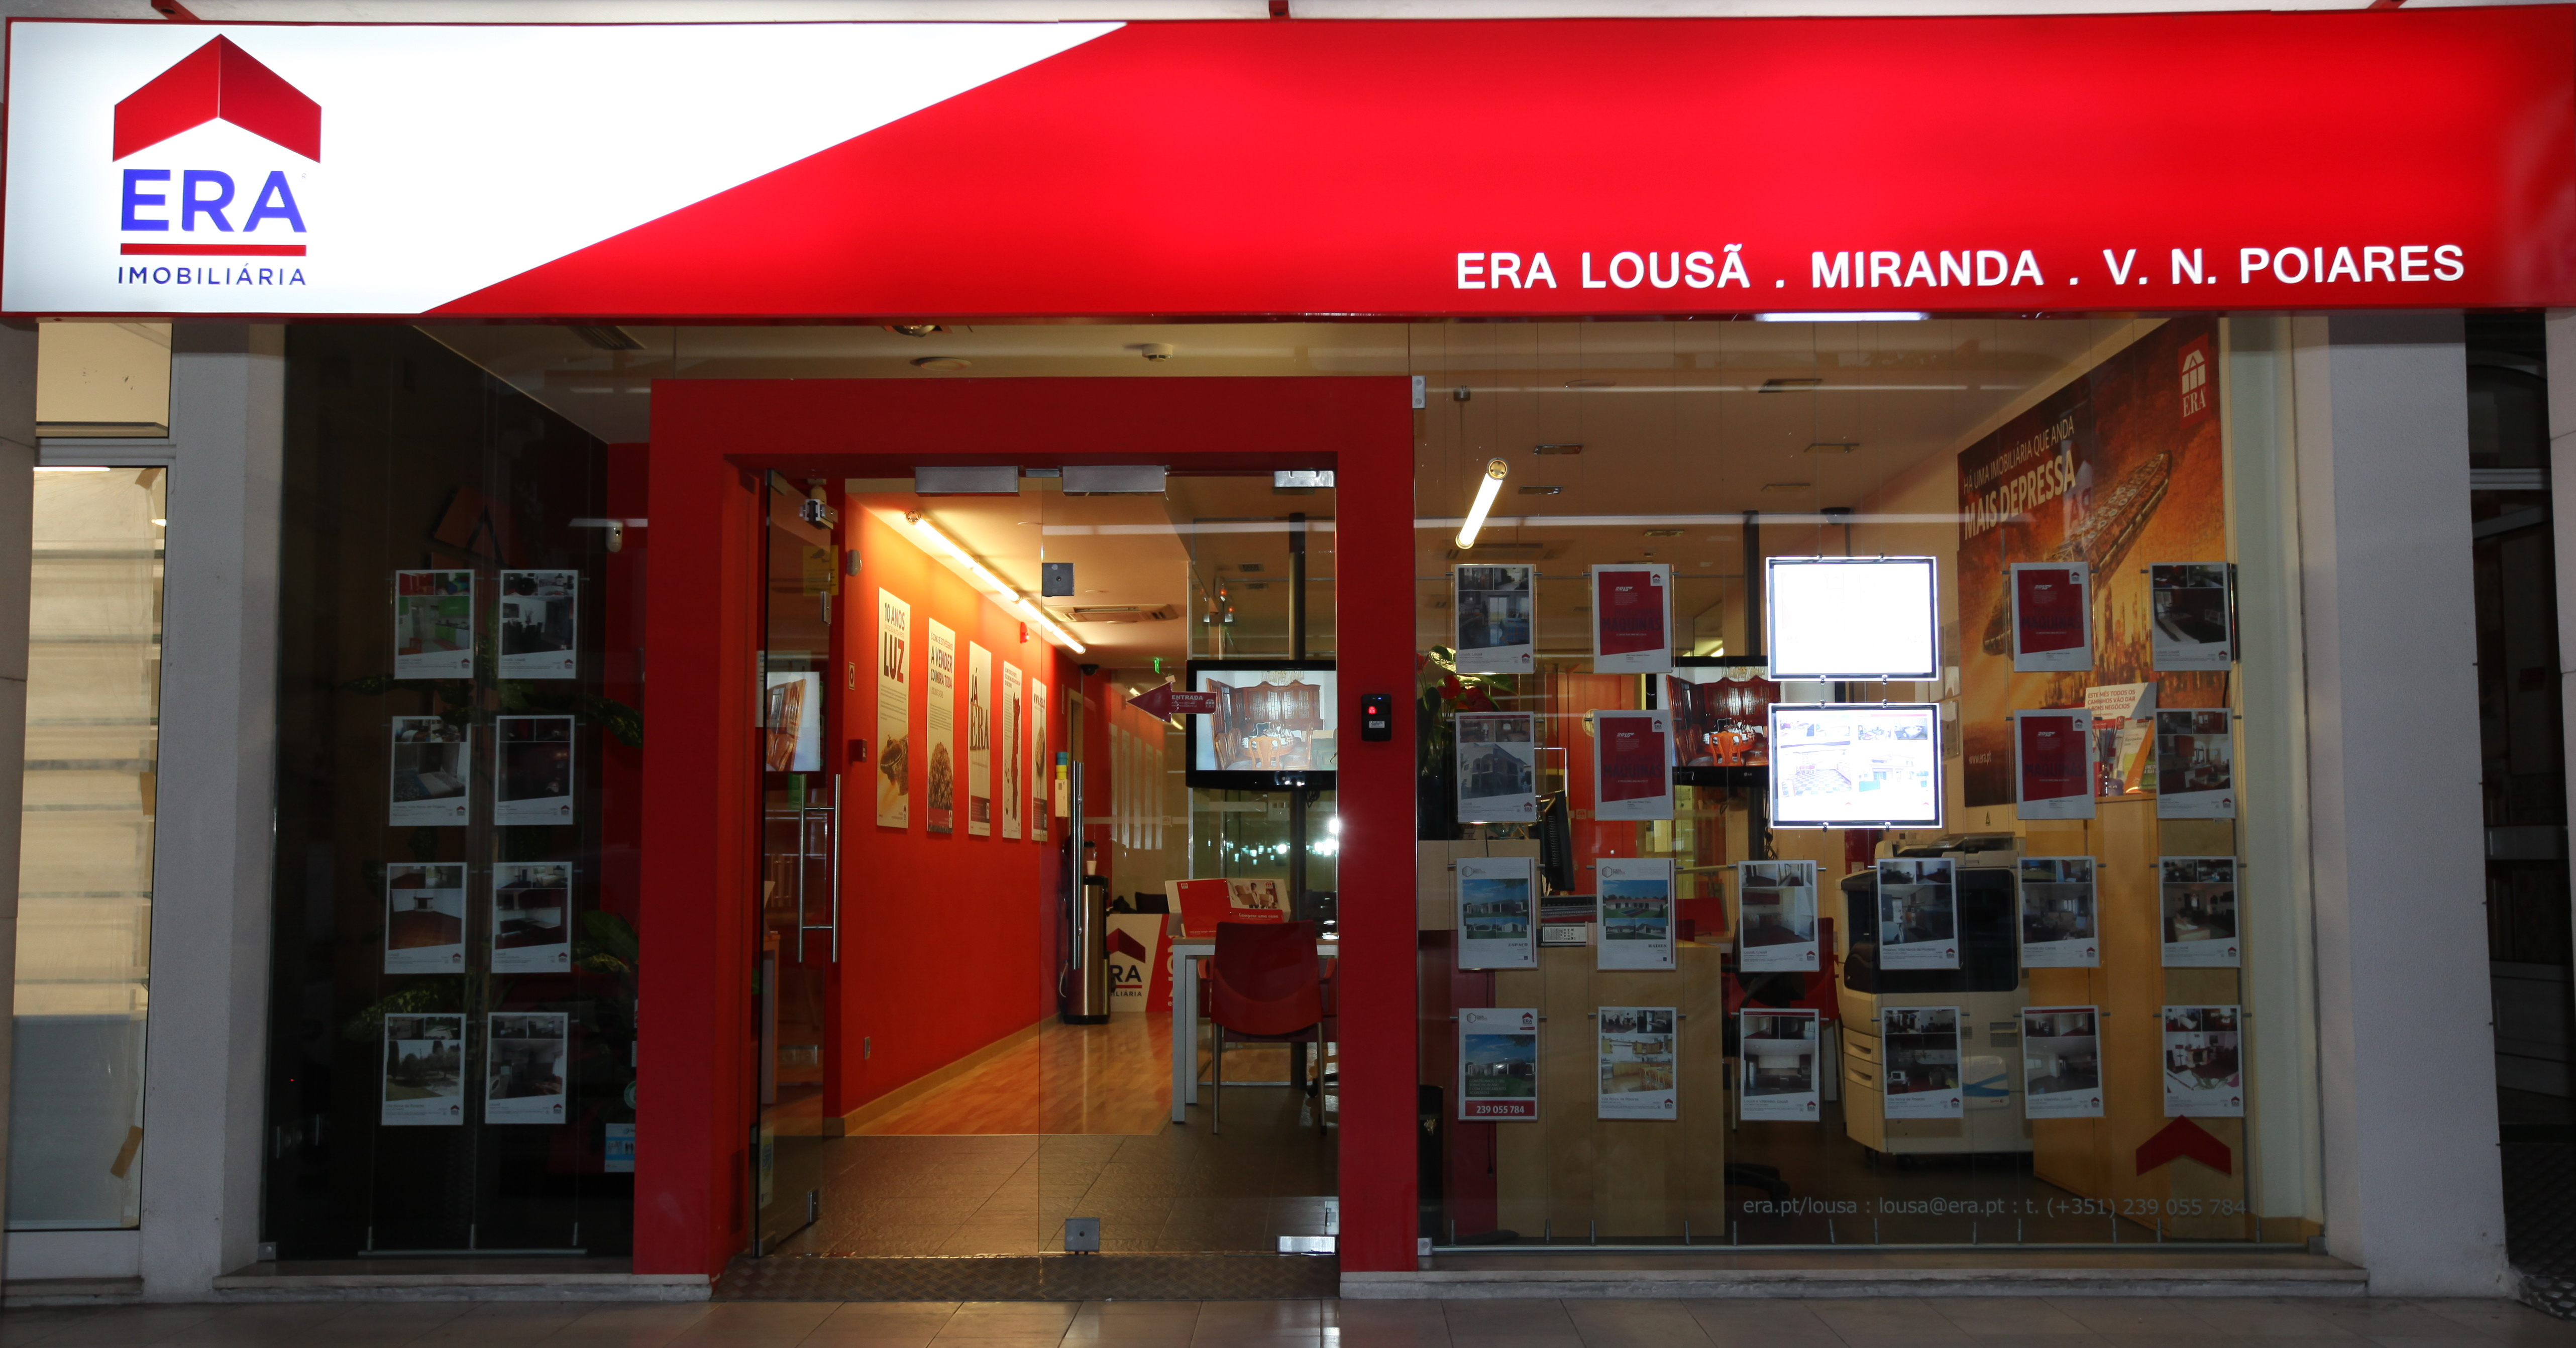 ERA Lousã / Miranda